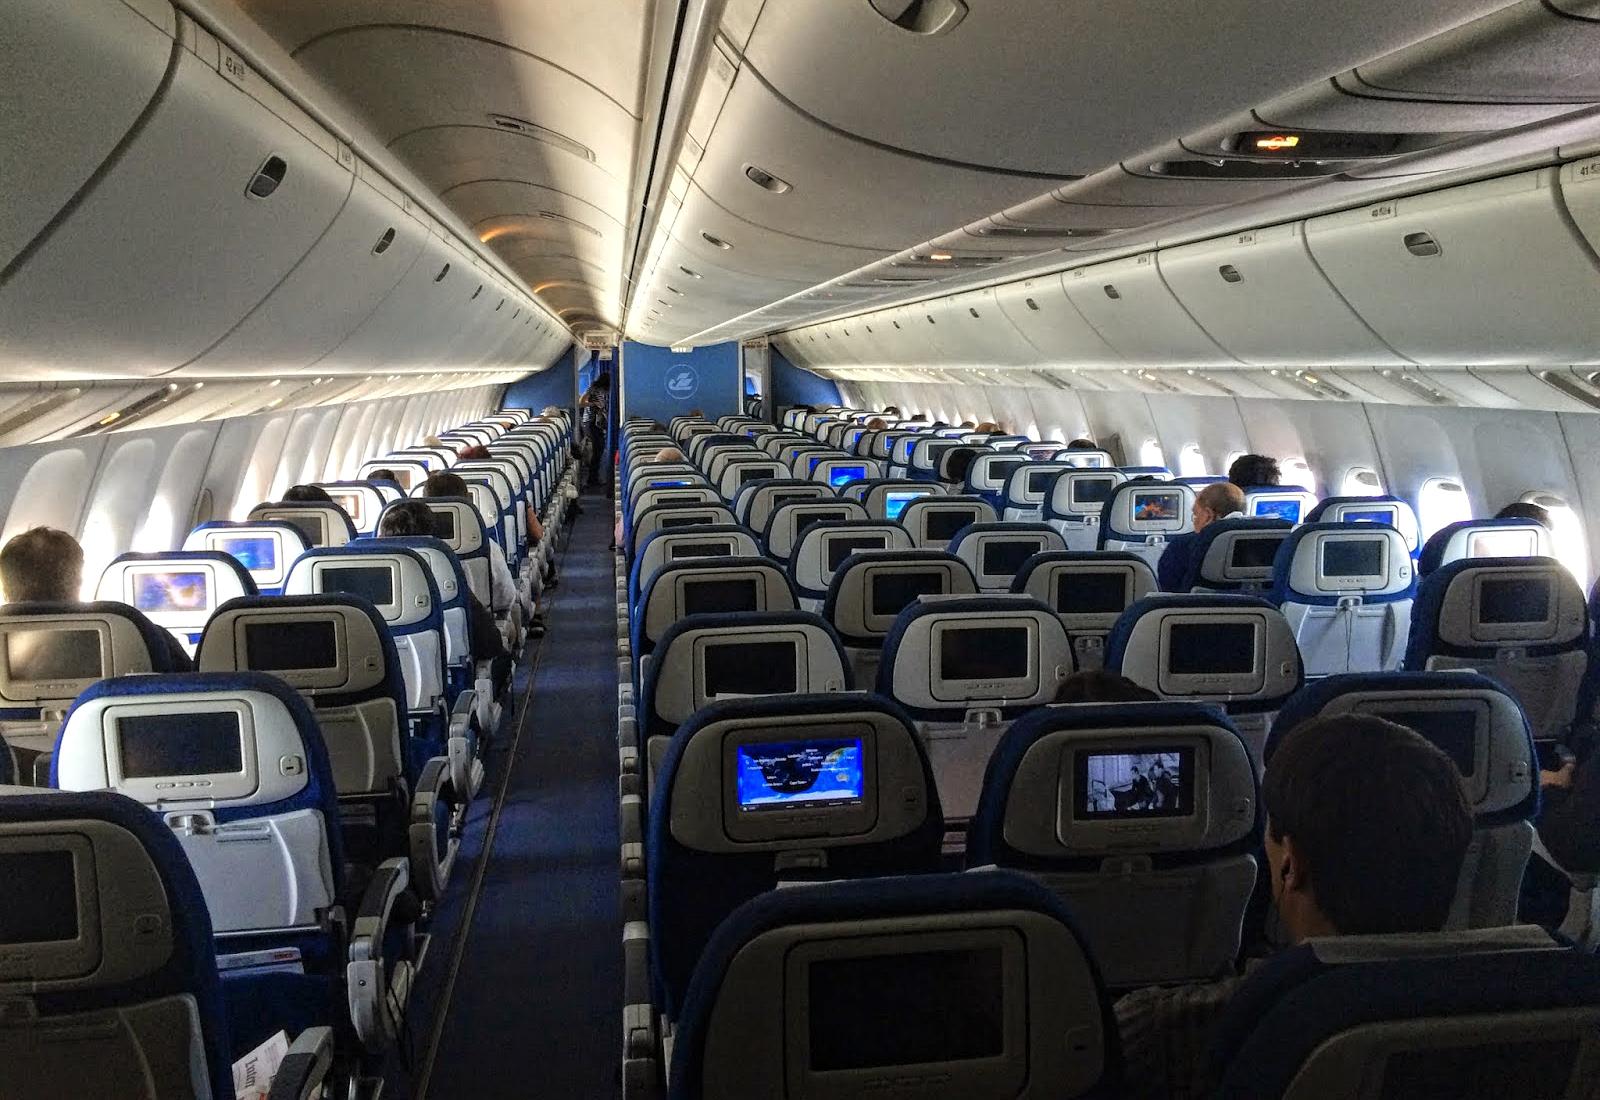 Uzbekistan Airways Boeing 787-8 Economy Class Interior